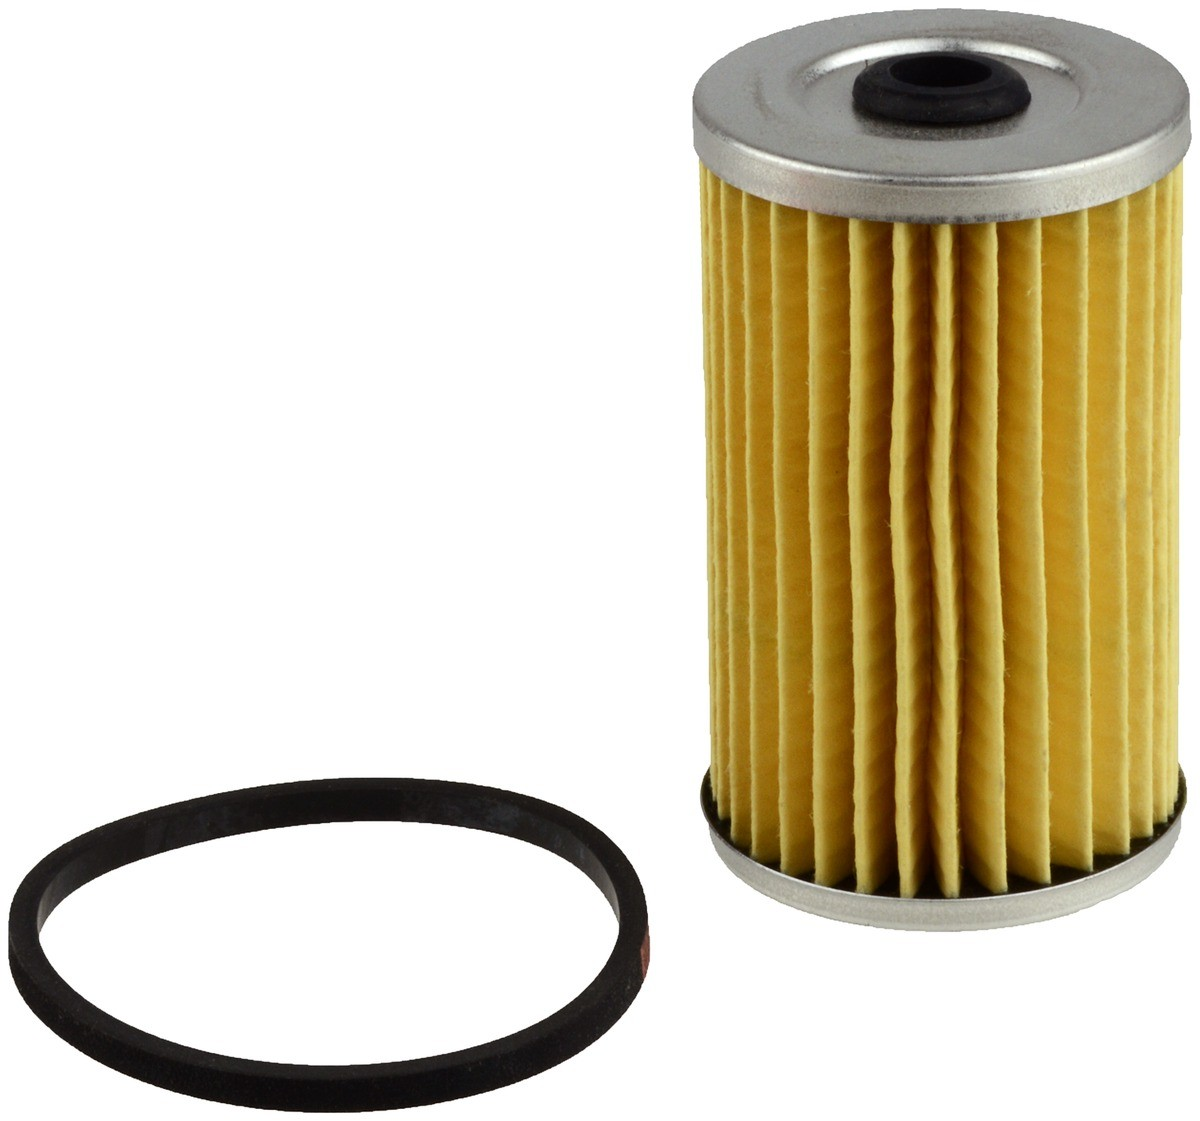 G6 Fuel Filter Location | Wiring Liry G Fuel Filter Location on